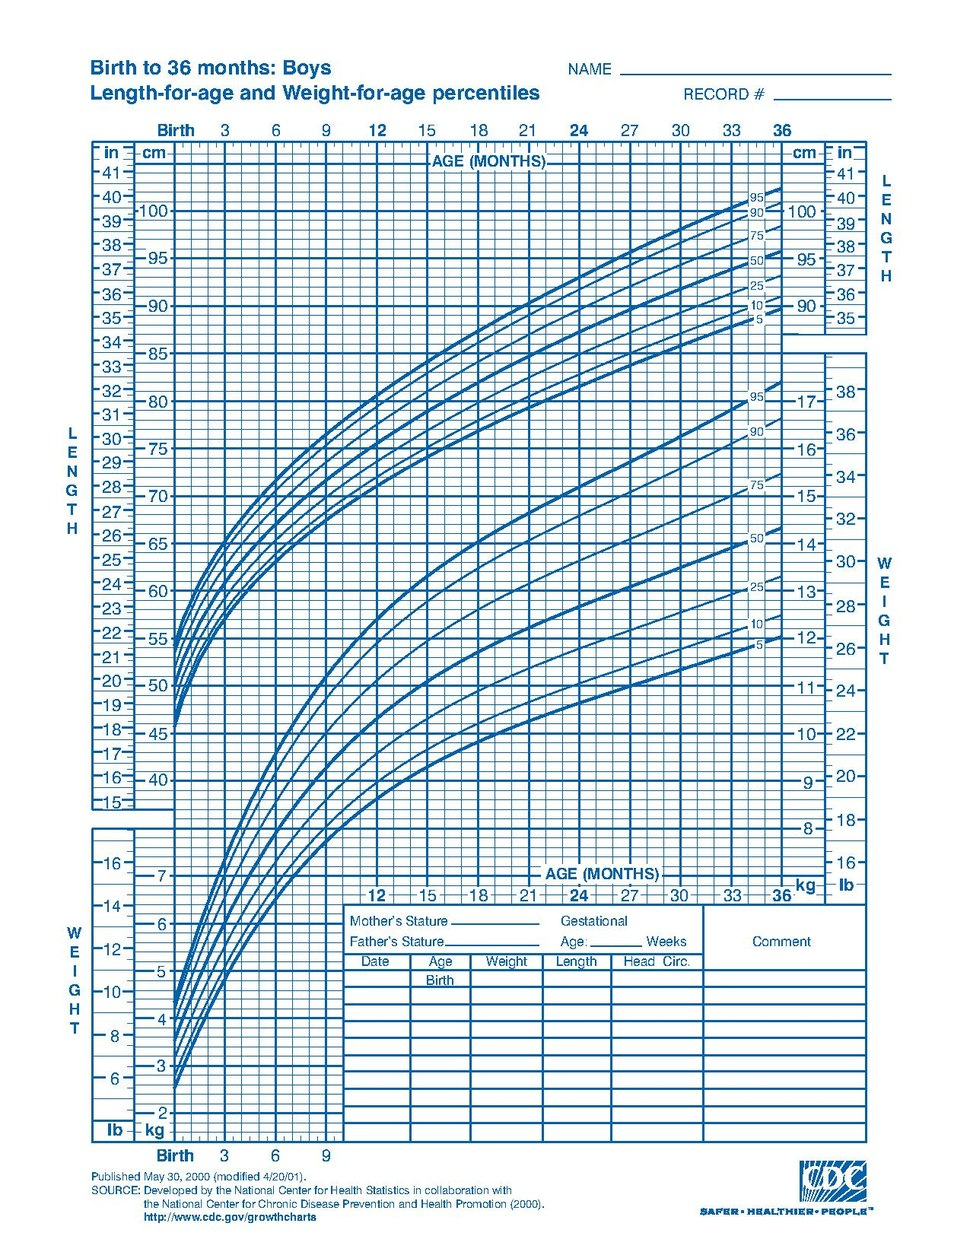 Growth chart howling pixel cdc growth chart boys birth to 36 mths cj41c017pdf nvjuhfo Gallery